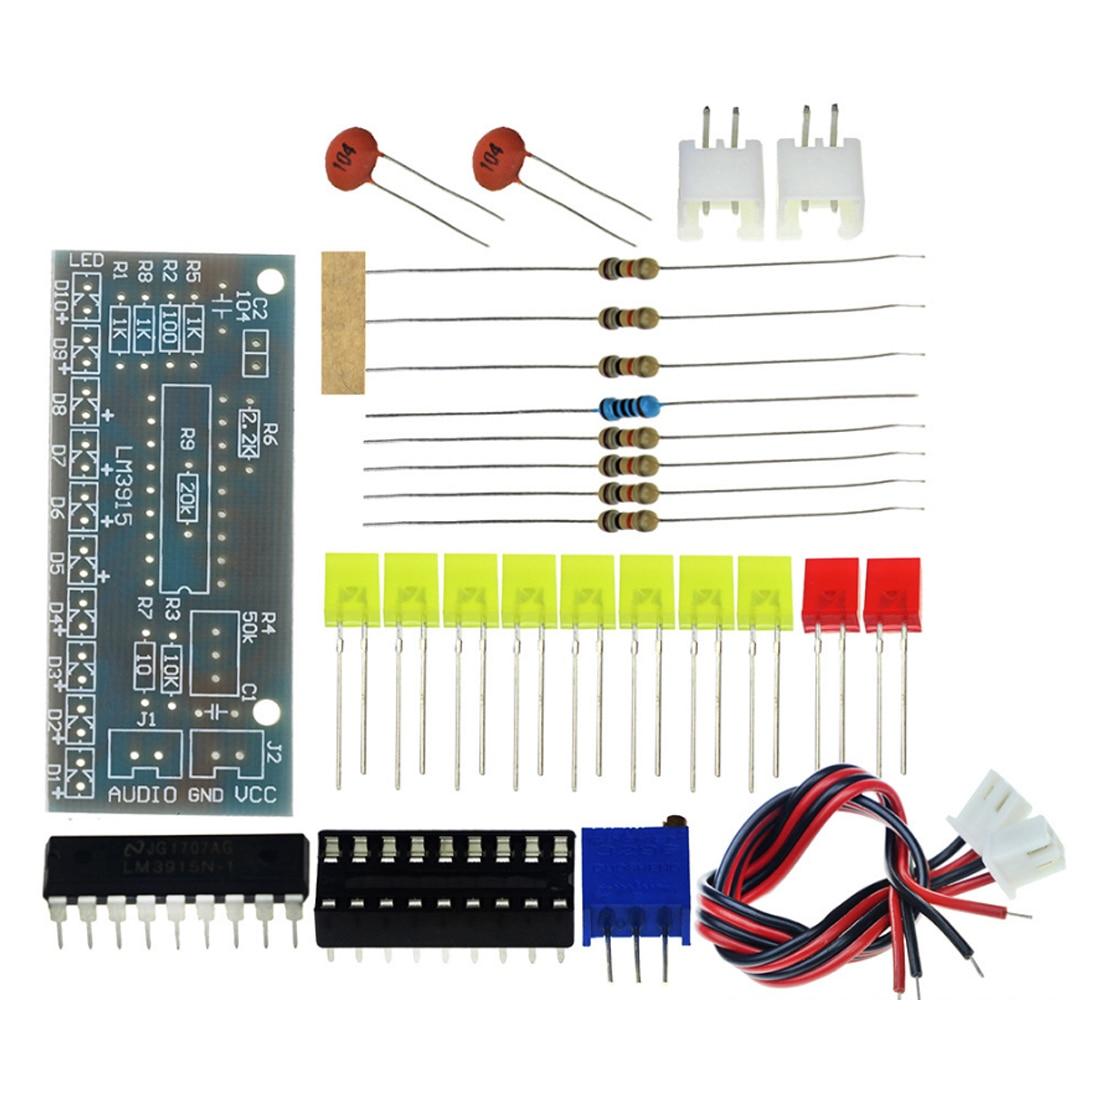 Electronic DIY Kit LM3915 Audio Level Indicator Production Suite DC 9V-12V Audio Indicator Suite